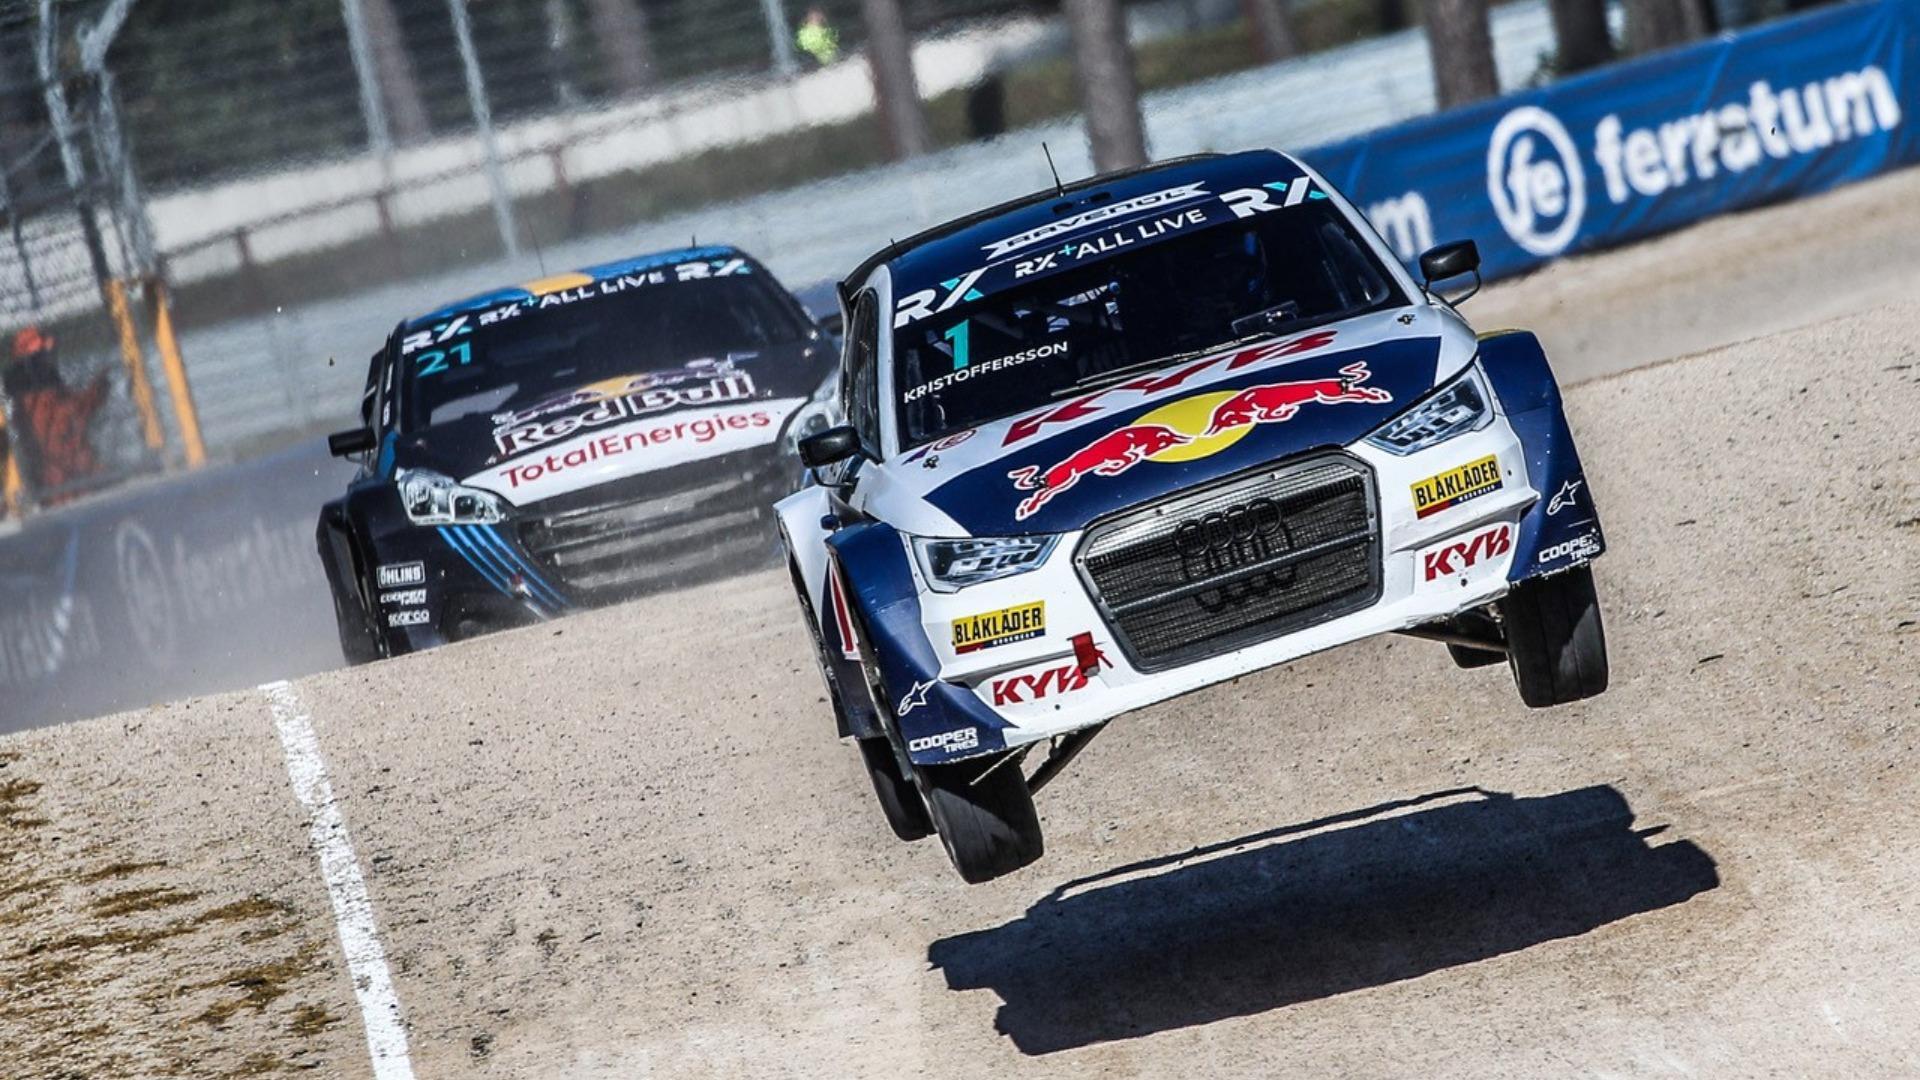 Ferratum World RX of Riga-Latvia 2   2021: World RX Final